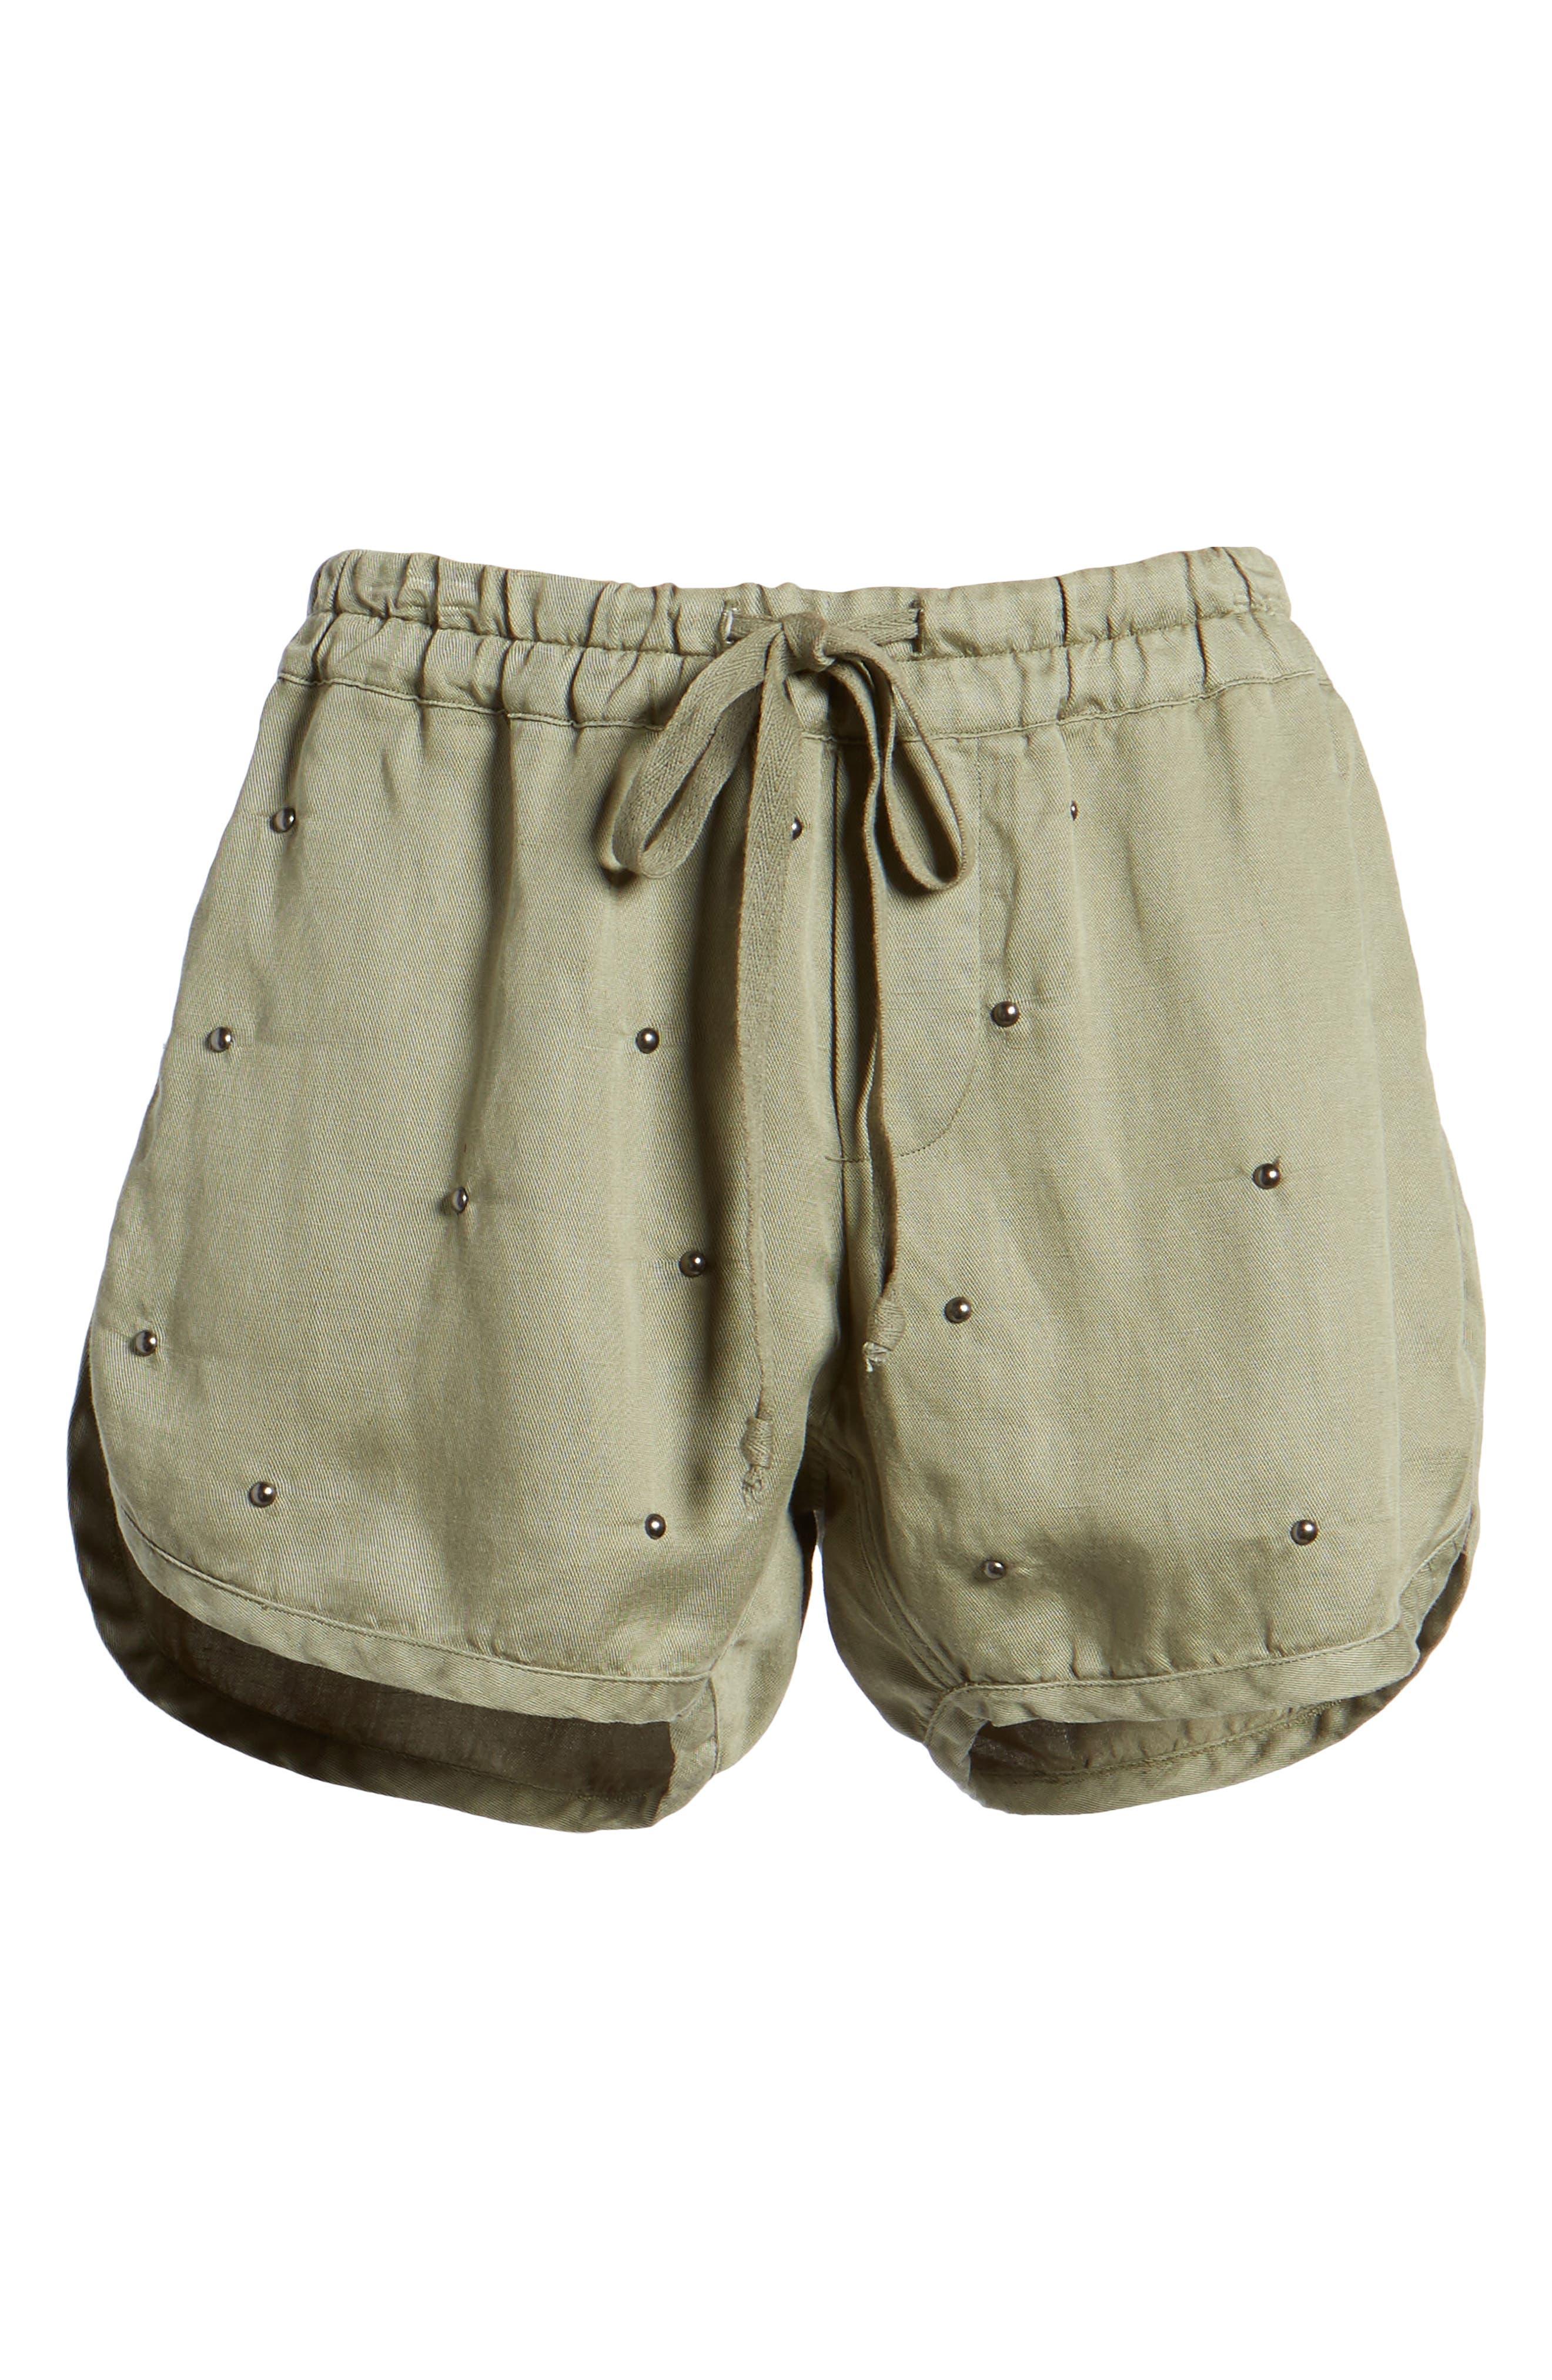 Thatcher Drawstring Shorts,                             Alternate thumbnail 6, color,                             307